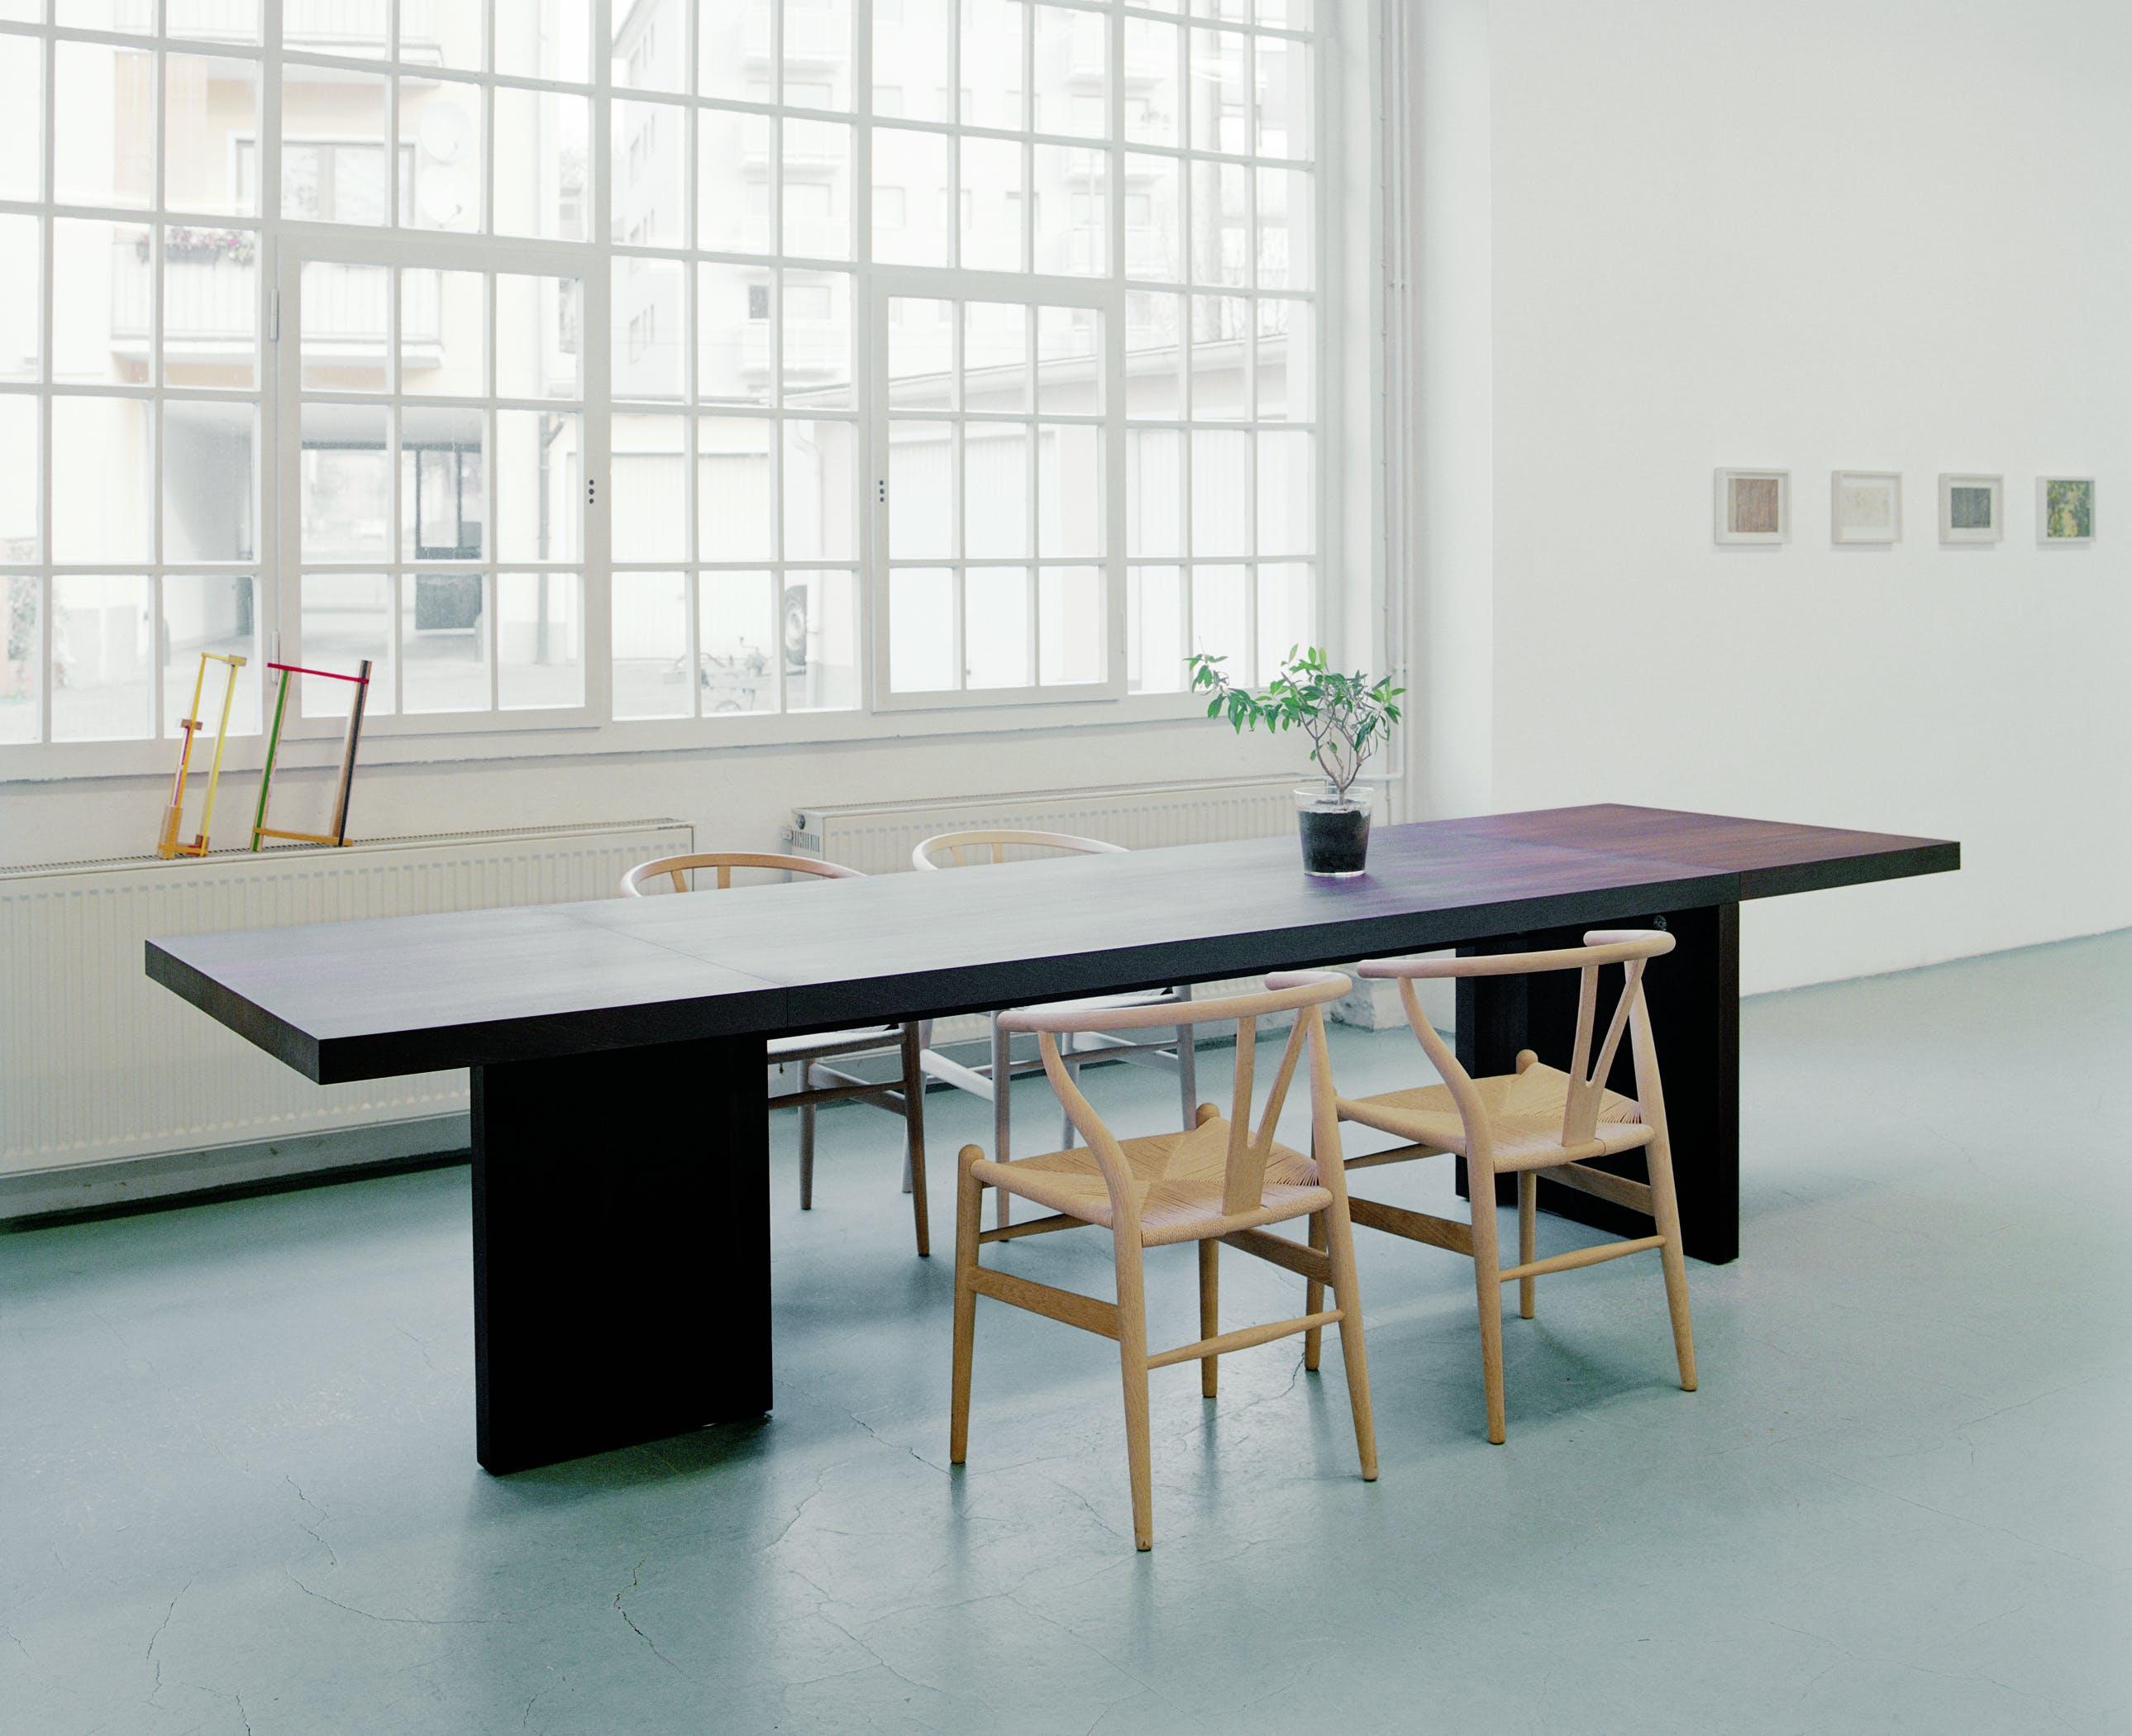 E15-furniture-isaac-table-black-angle-haute-living